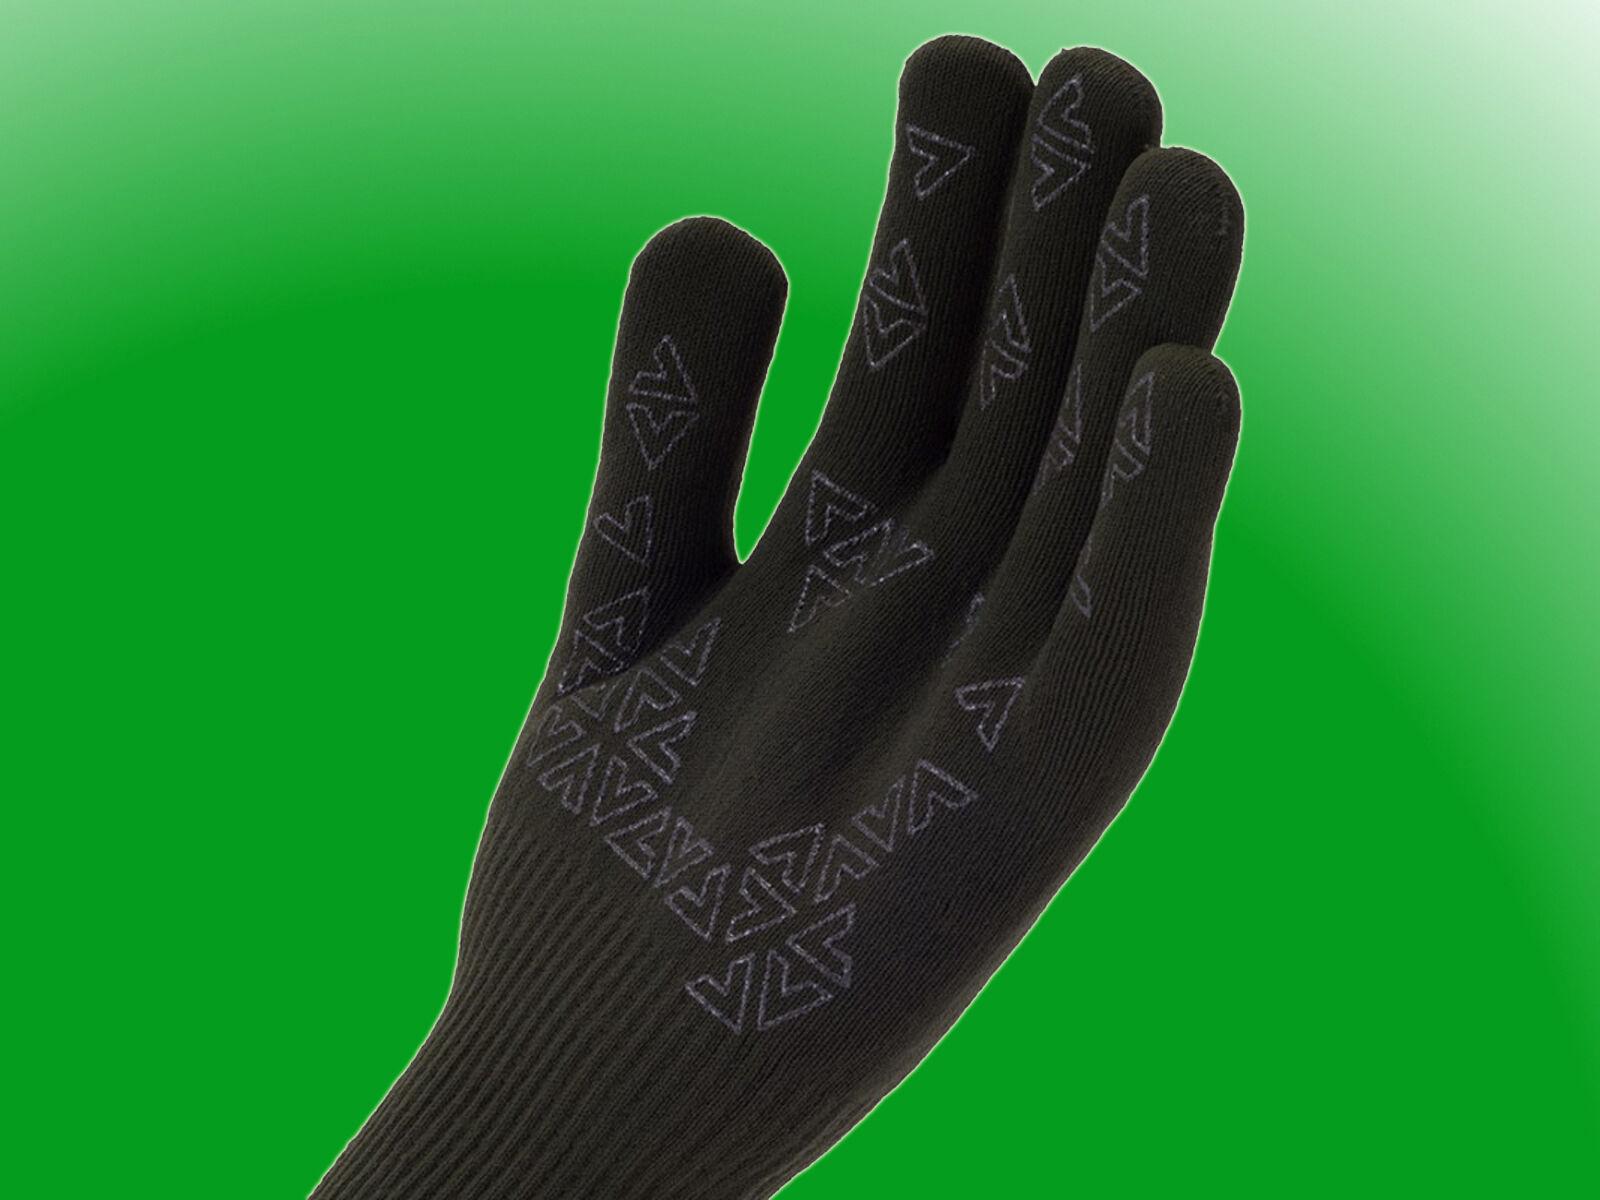 Ultra Grip oliv - Seal Skinz wasserdichte     wasserfeste Handschuhe 23ac72